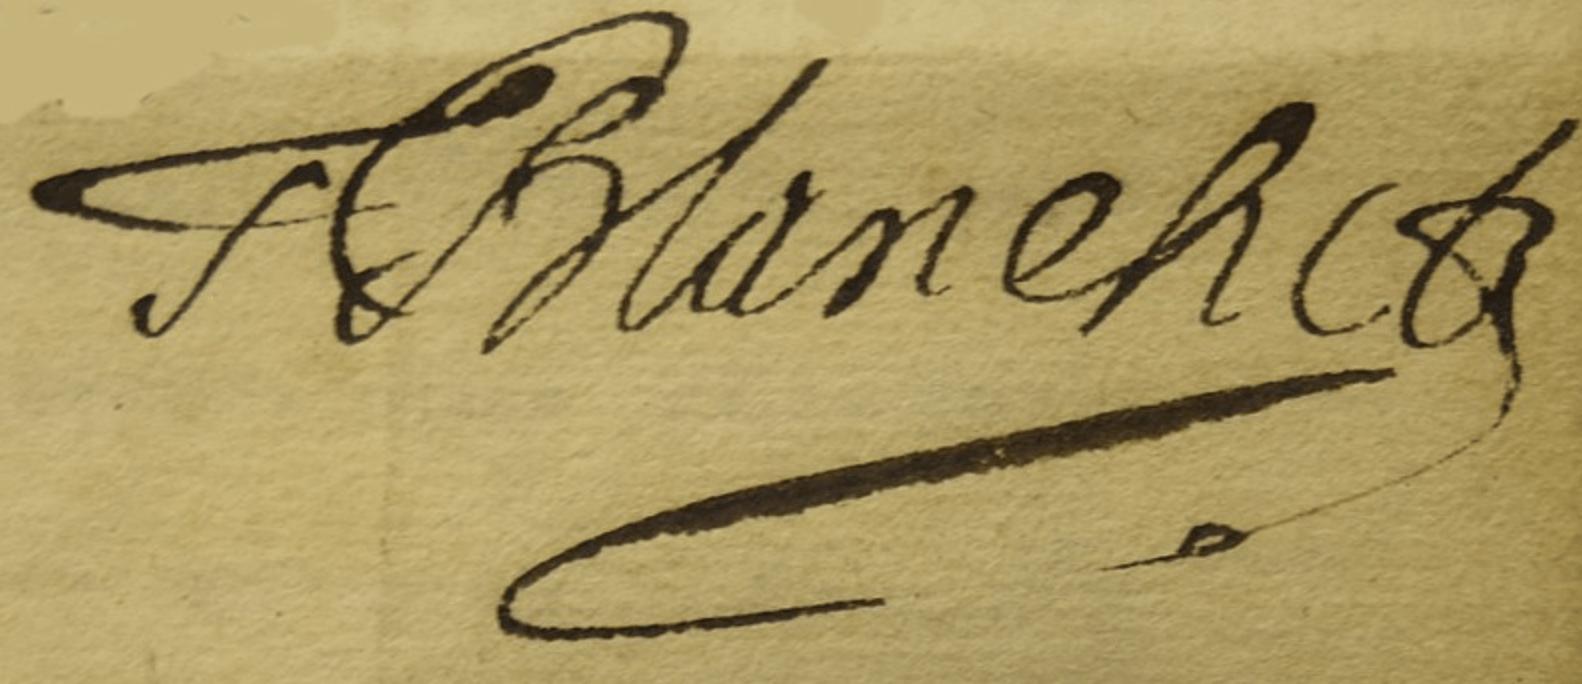 Thomas BLANCHET signature